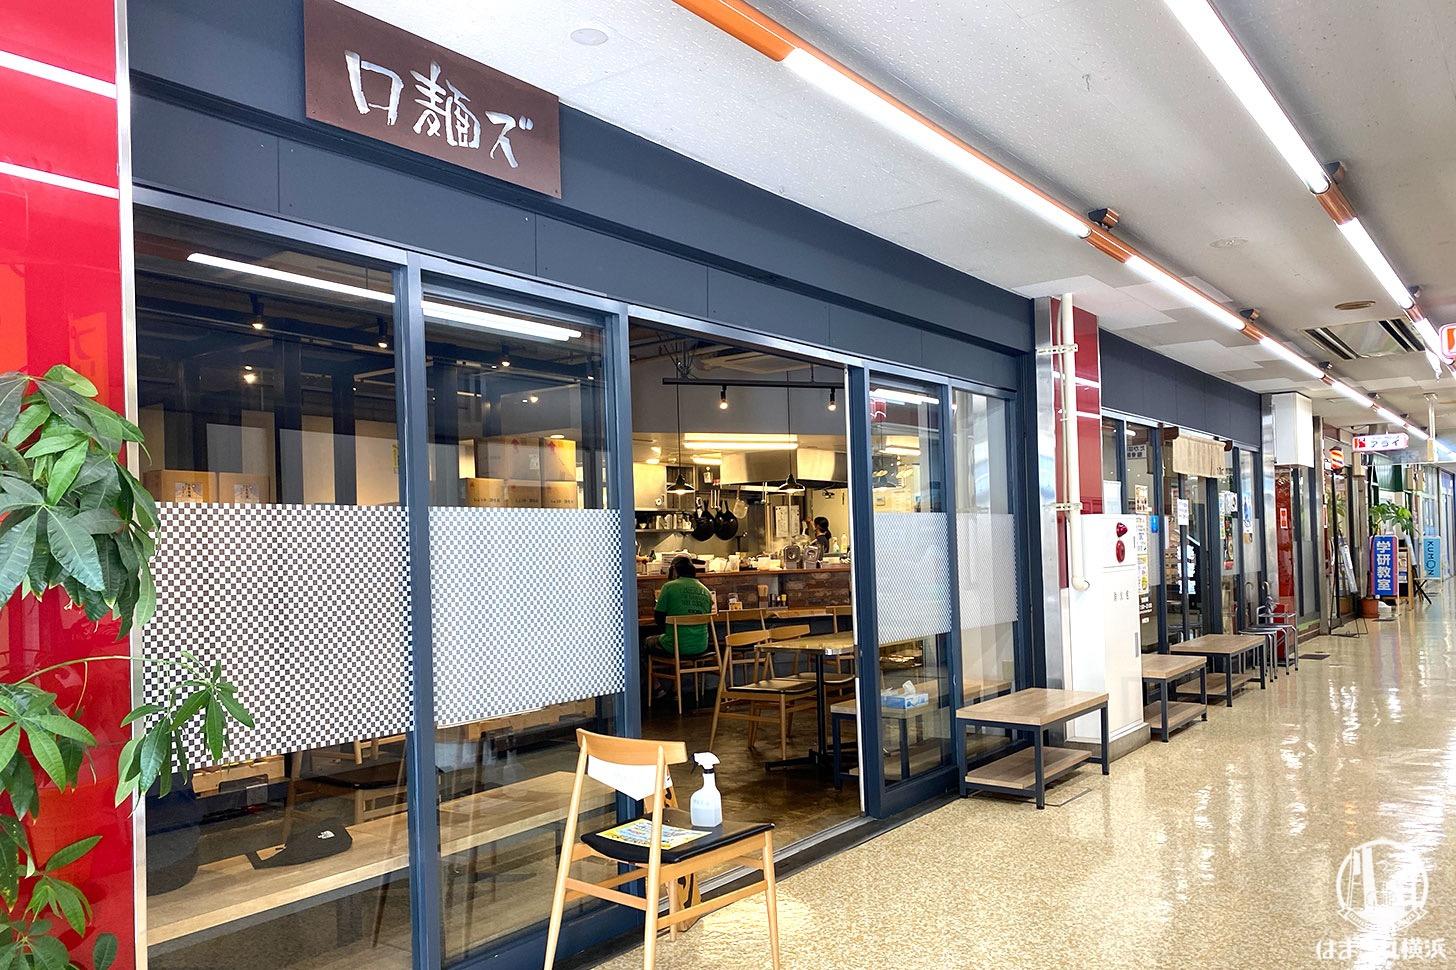 横浜・弘明寺「ロ麺ズ」外観